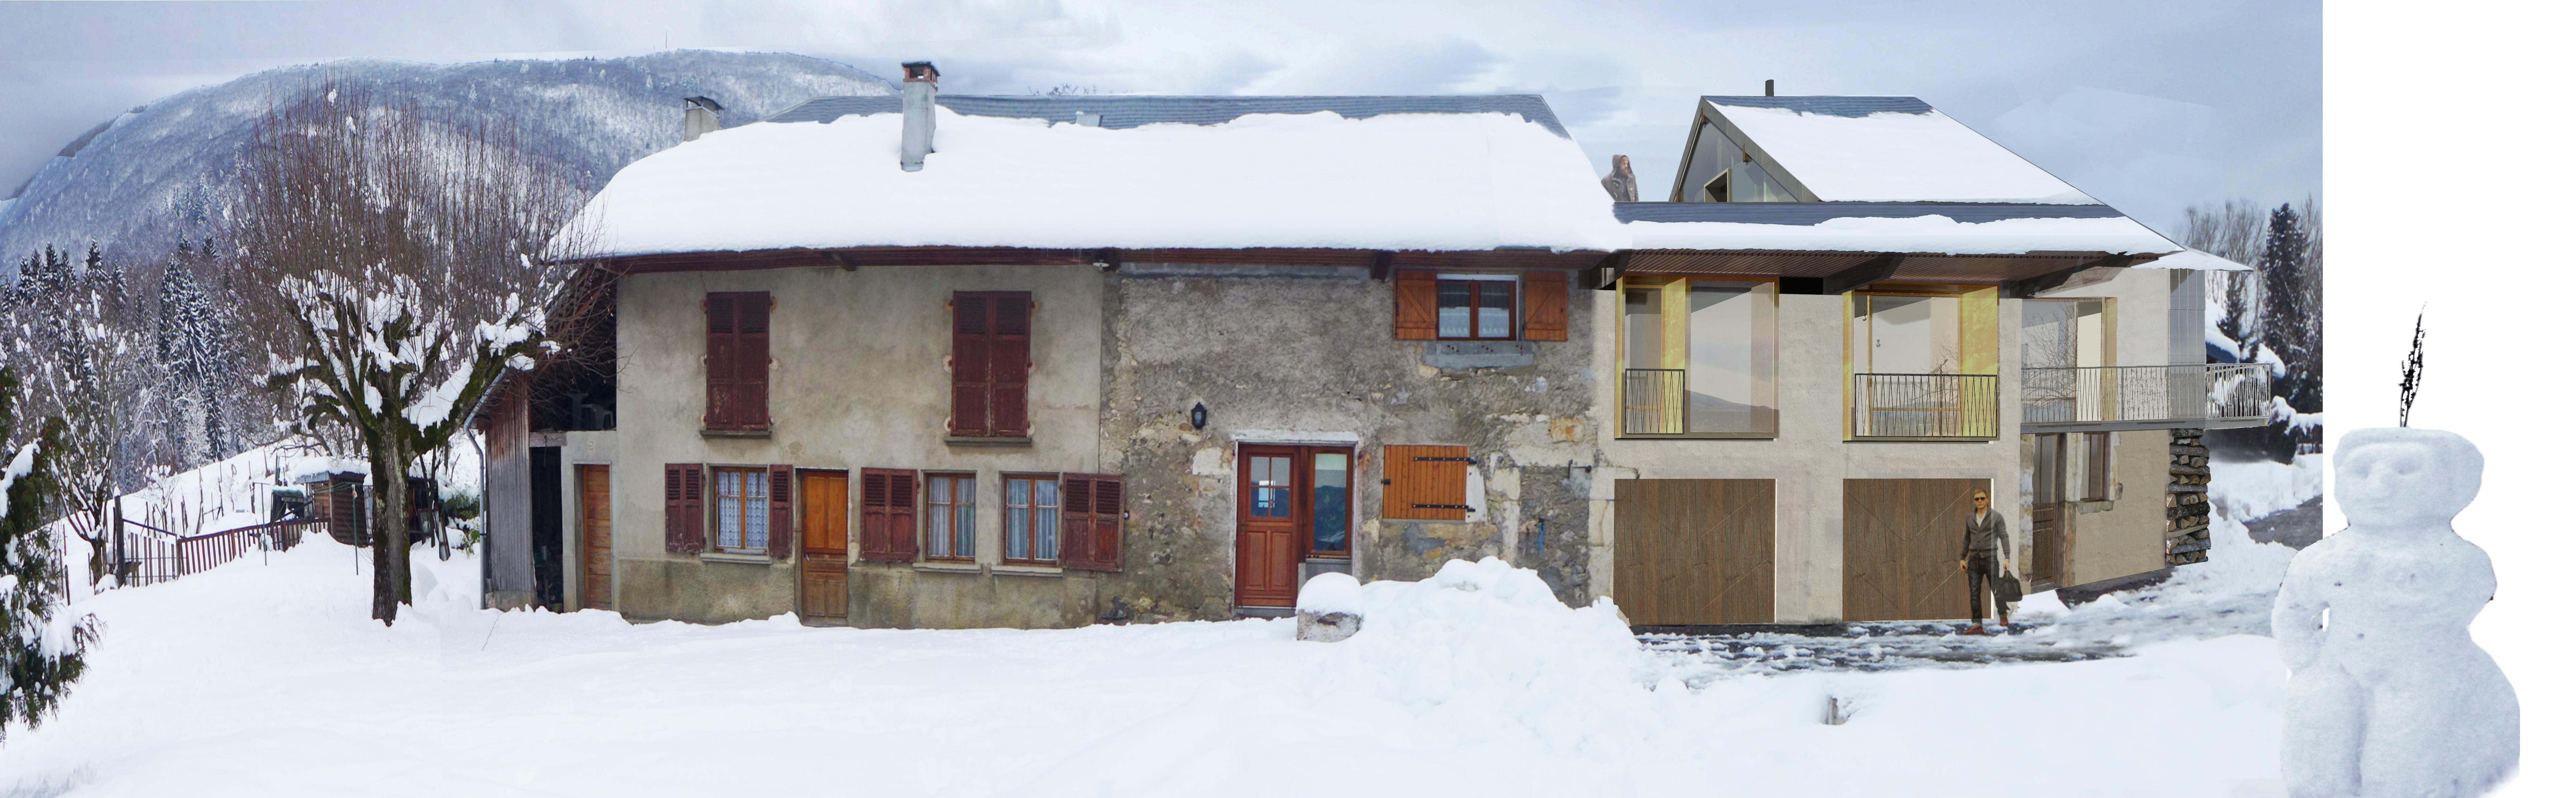 La façade principale réhabilitée